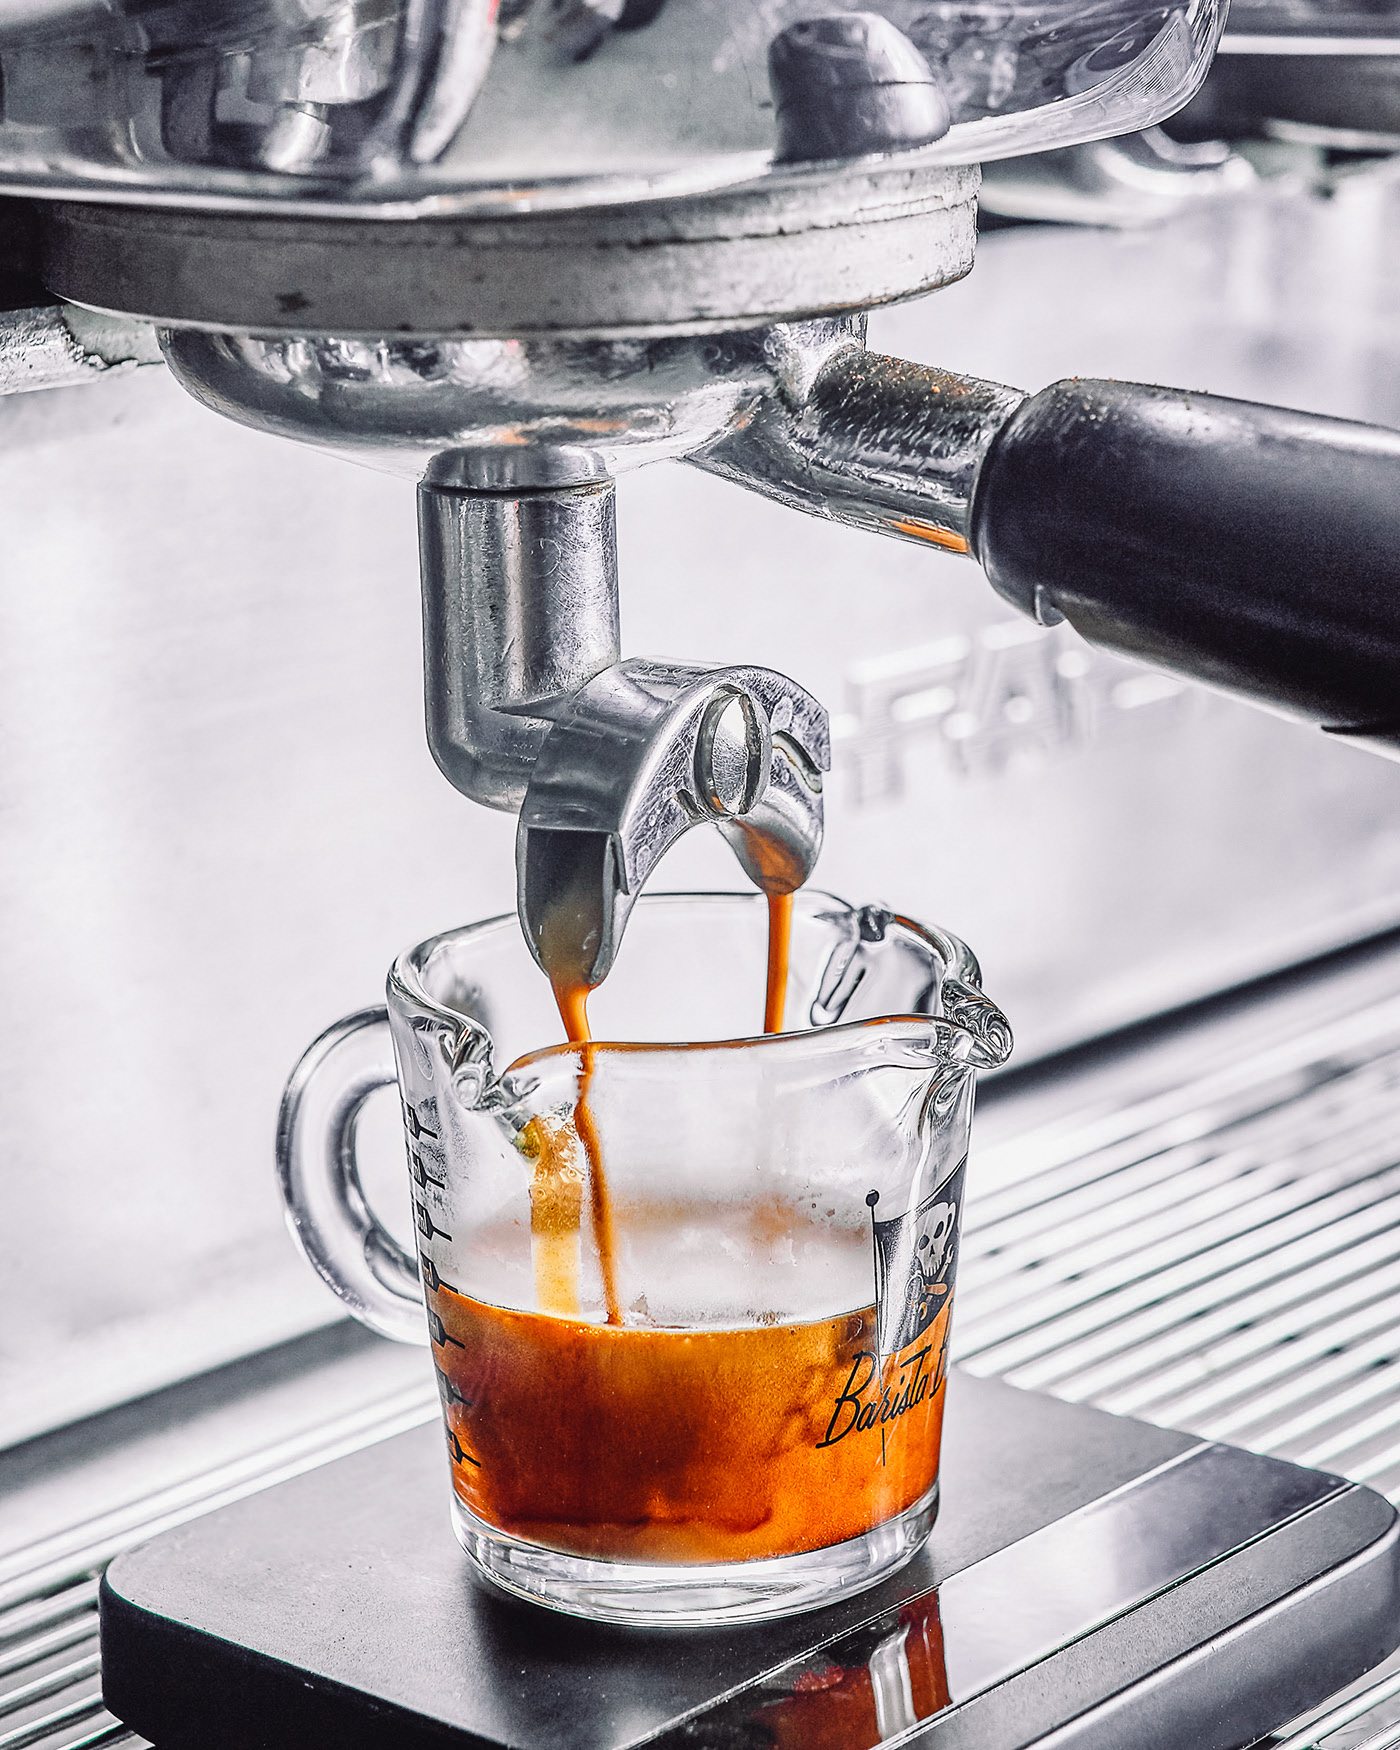 Social Coffee - Food Commercial Photography / фото Doaa Hamza